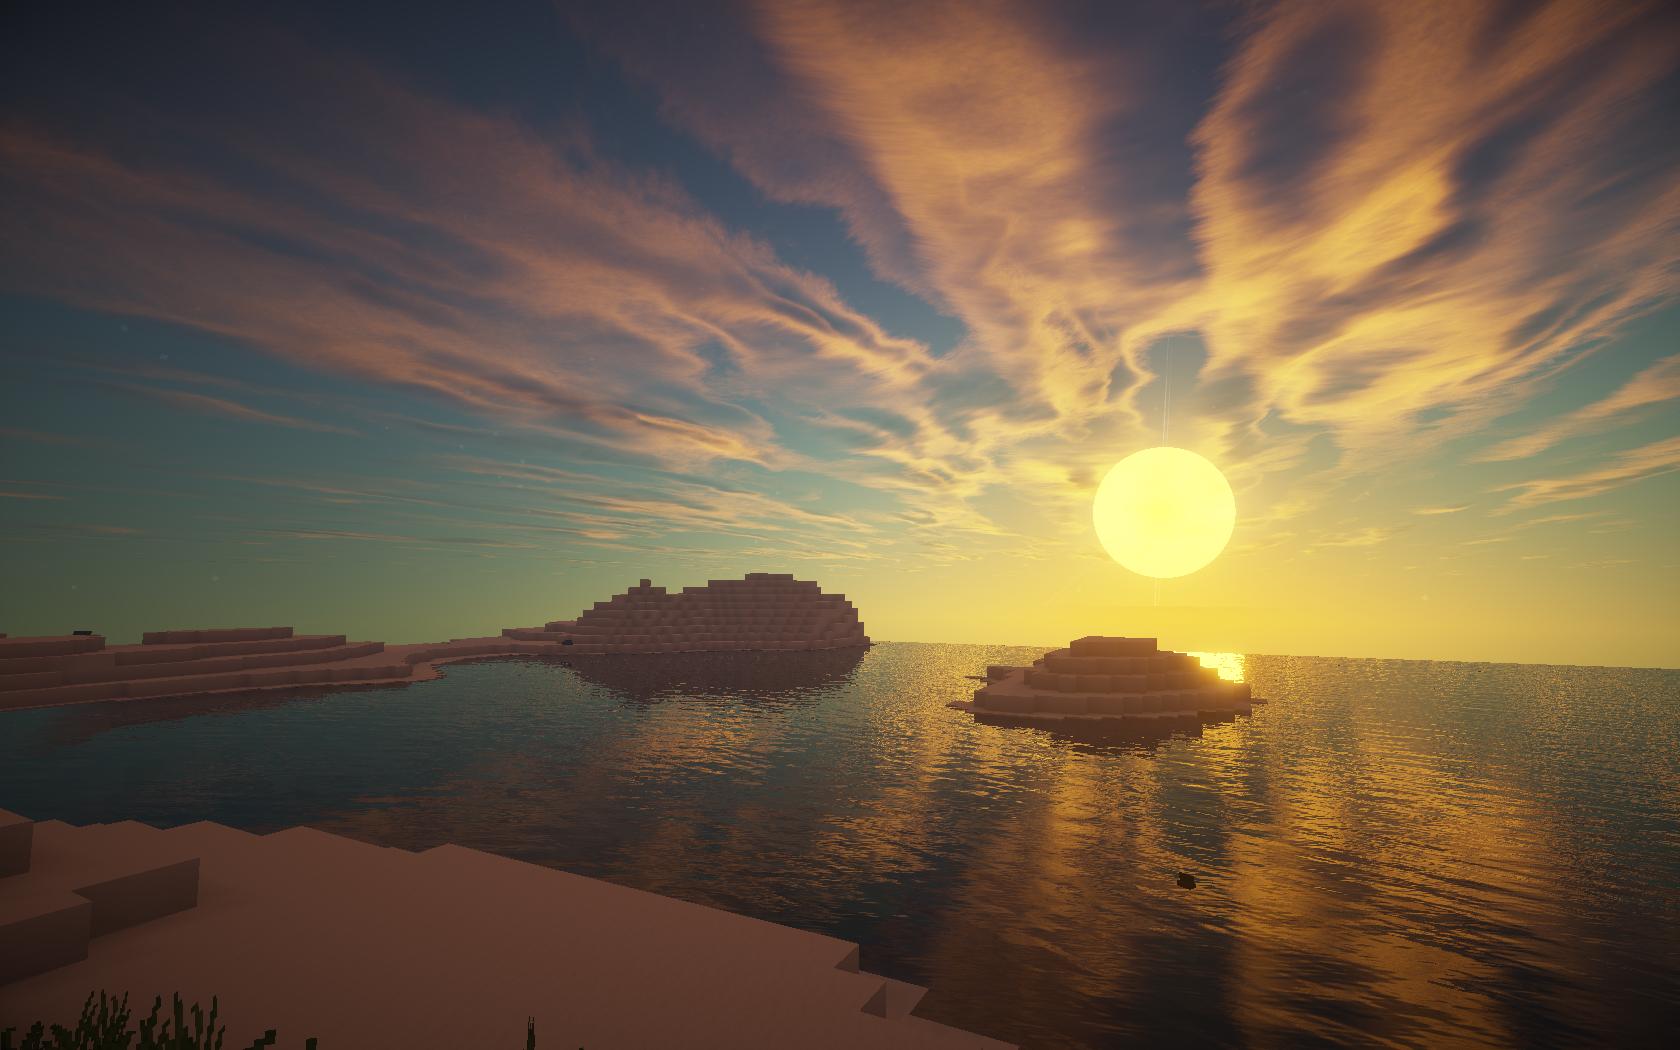 Fond d 39 cran minecraft minecraft - Fond ecran coucher de soleil sur la mer ...